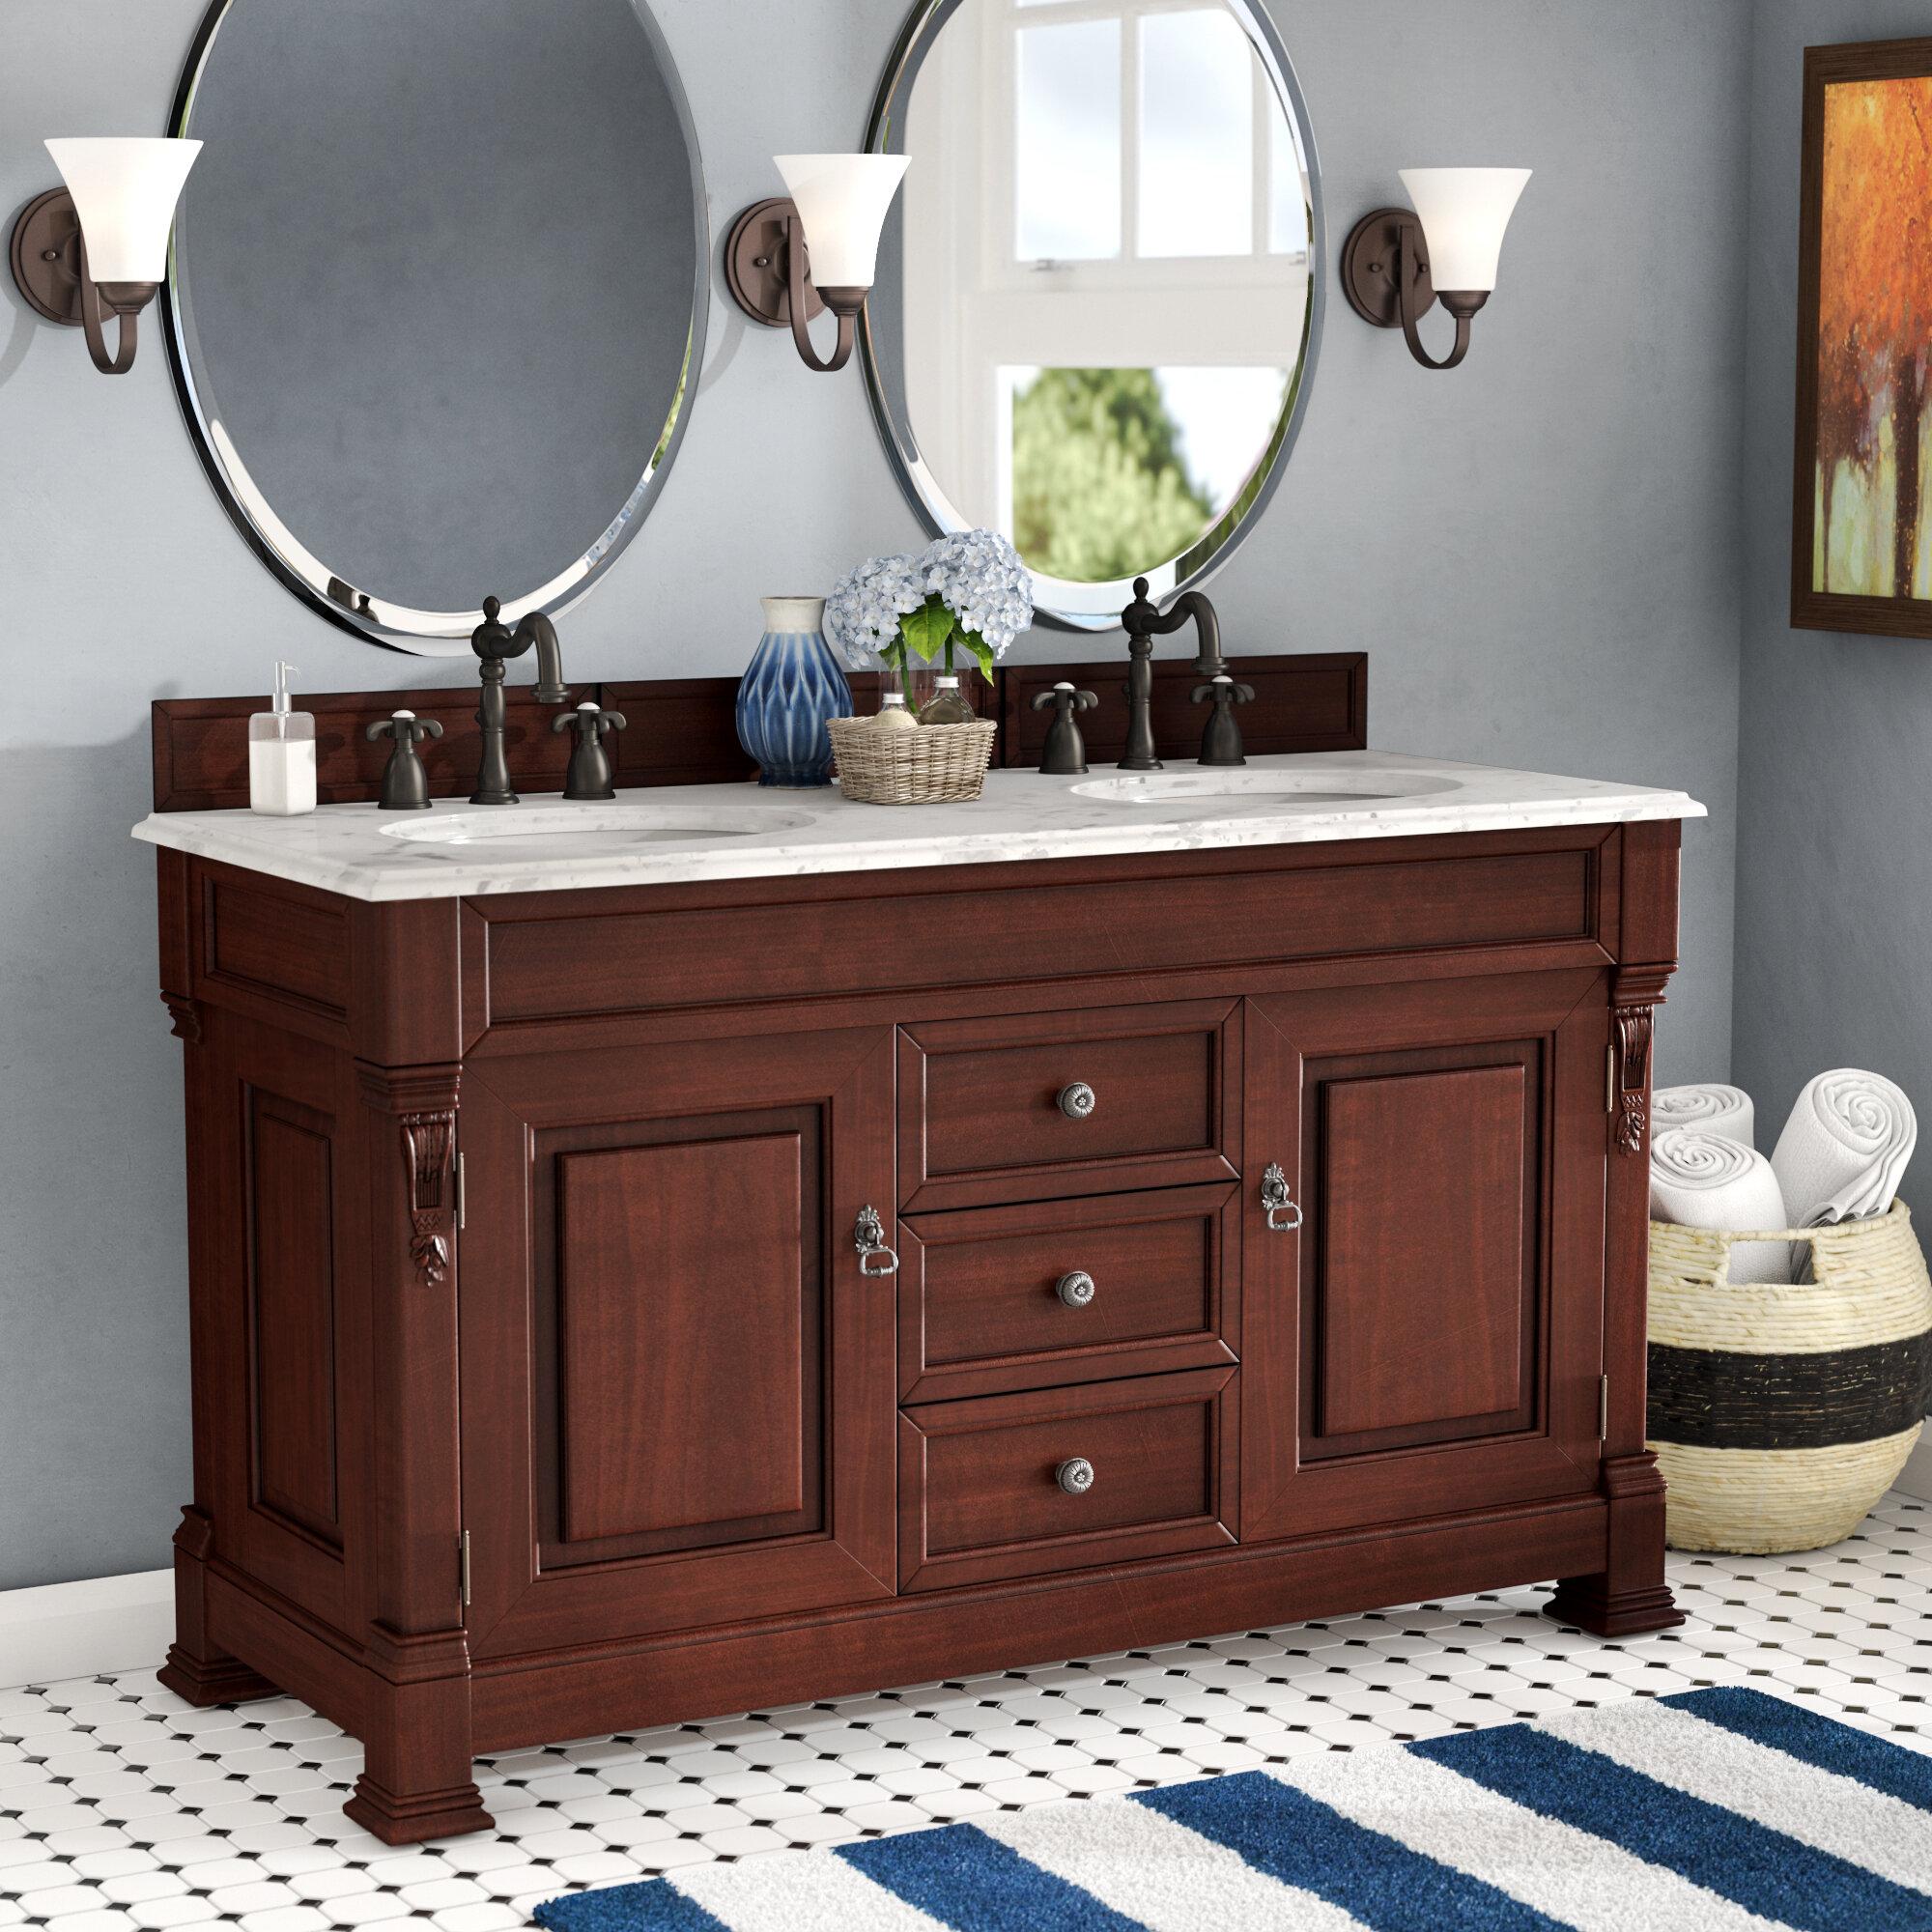 Darby Home Co Bedrock 60 Double Bathroom Vanity Set With Drawers Reviews Wayfair